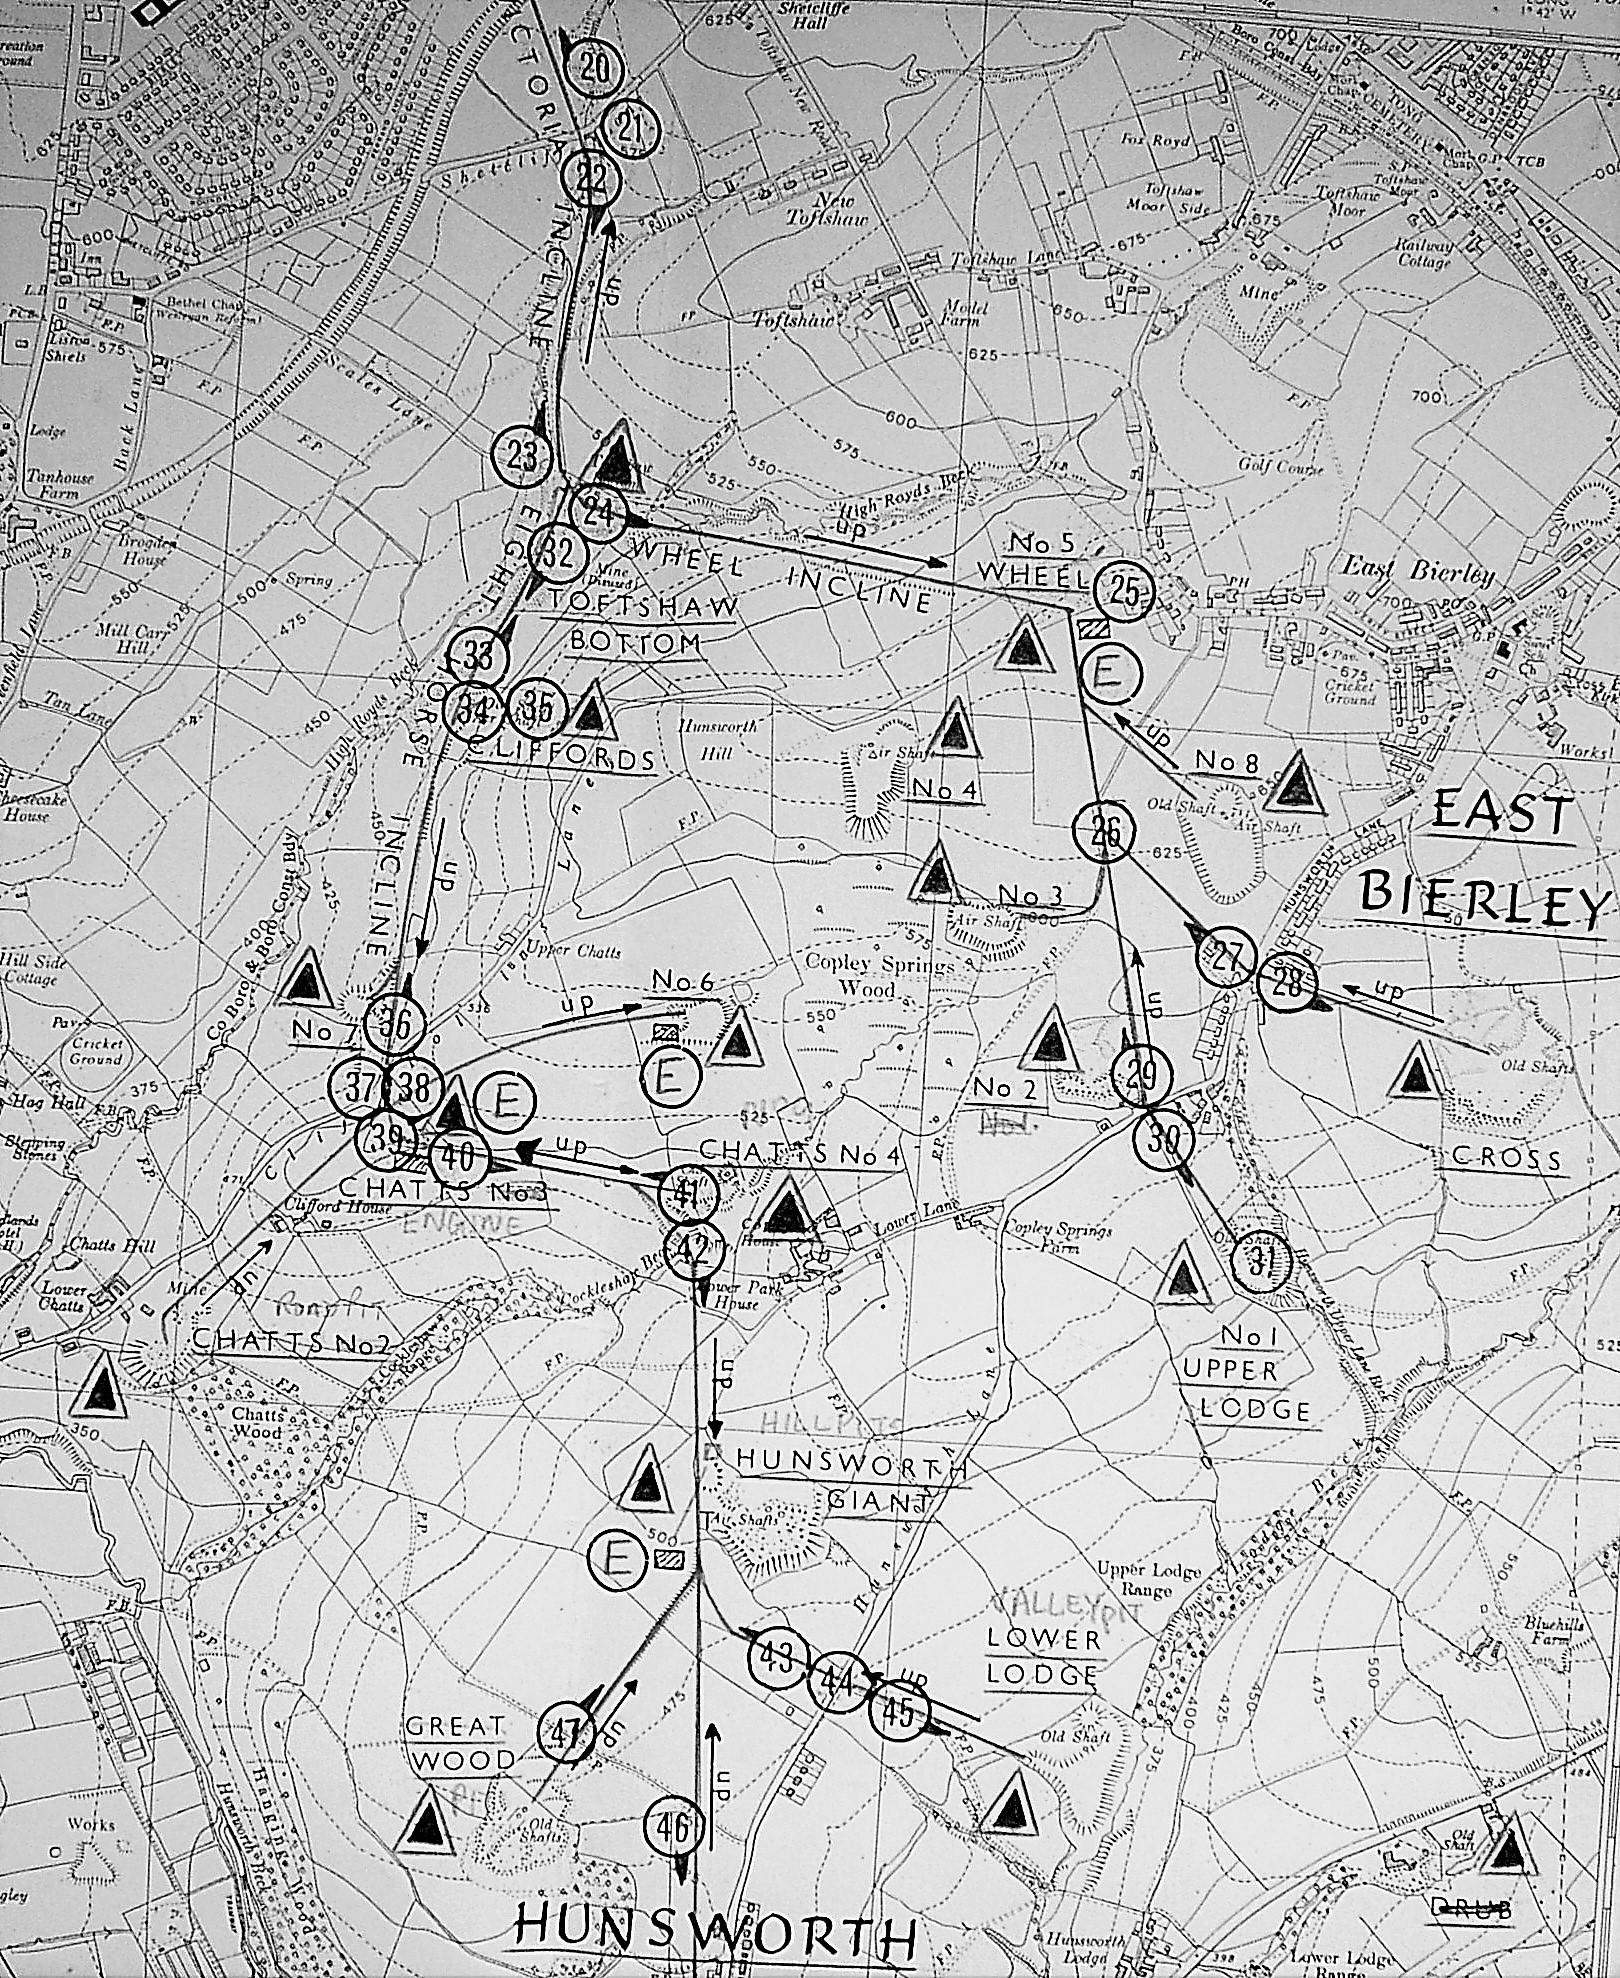 East Bierley tramways